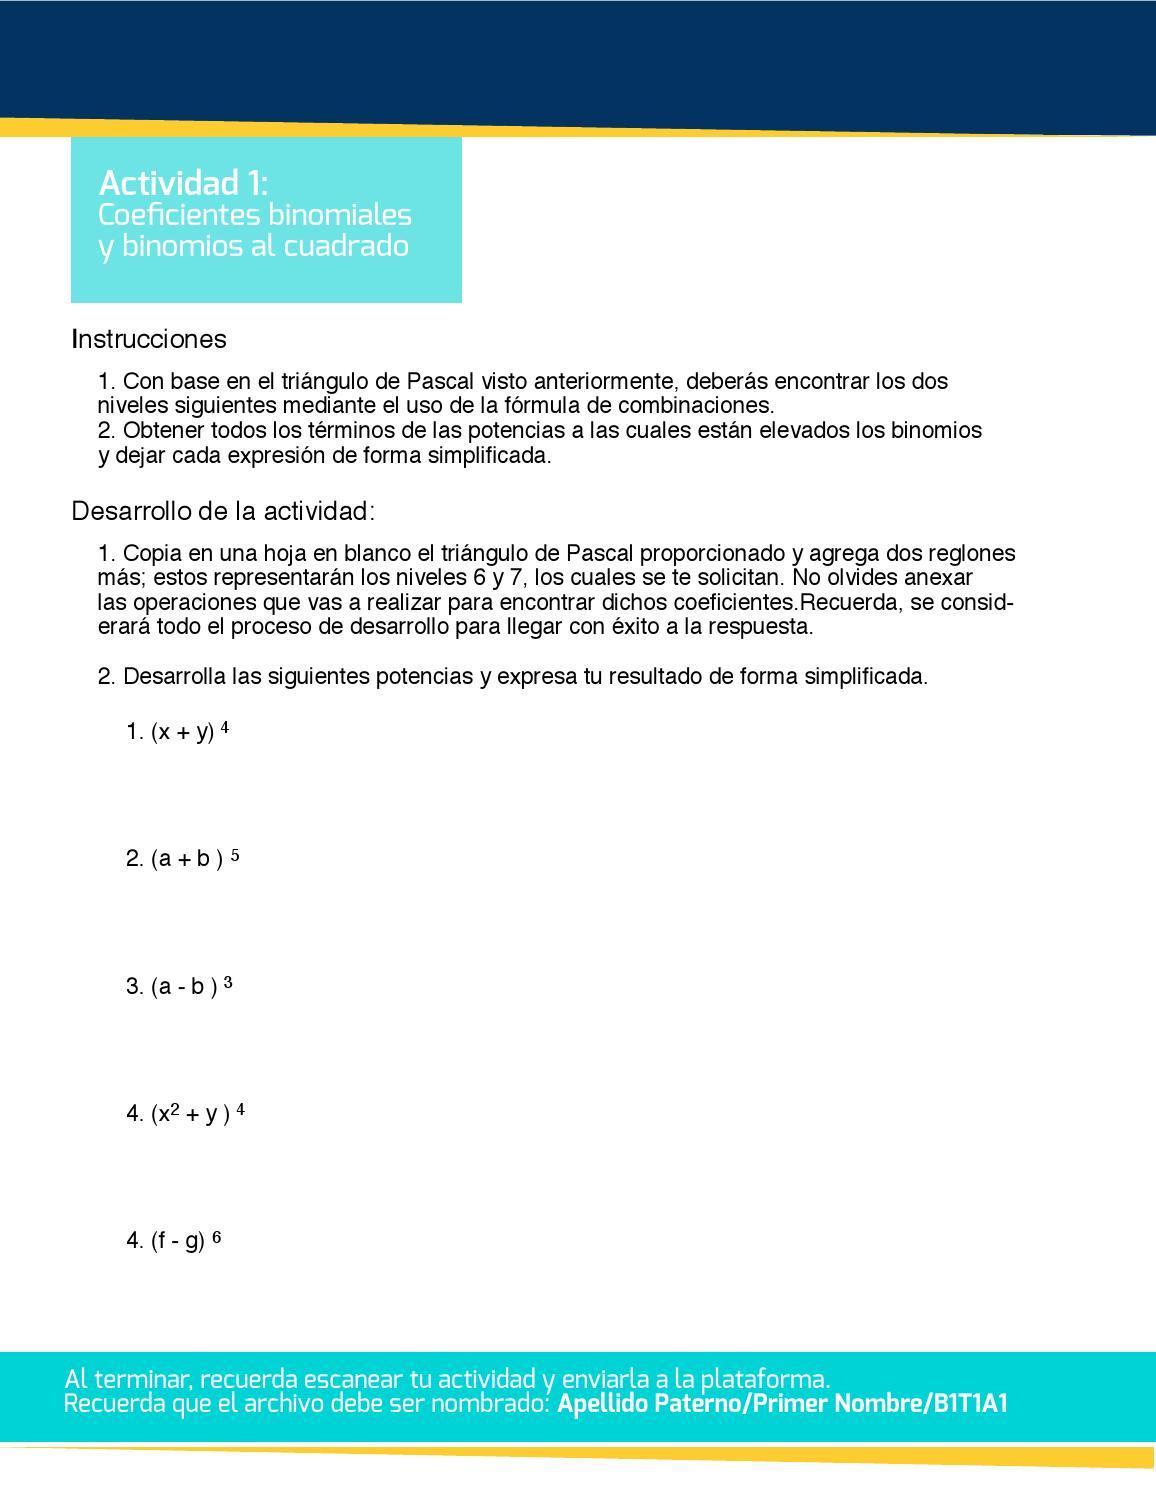 Coeficientes binomiales by Multimedia - issuu